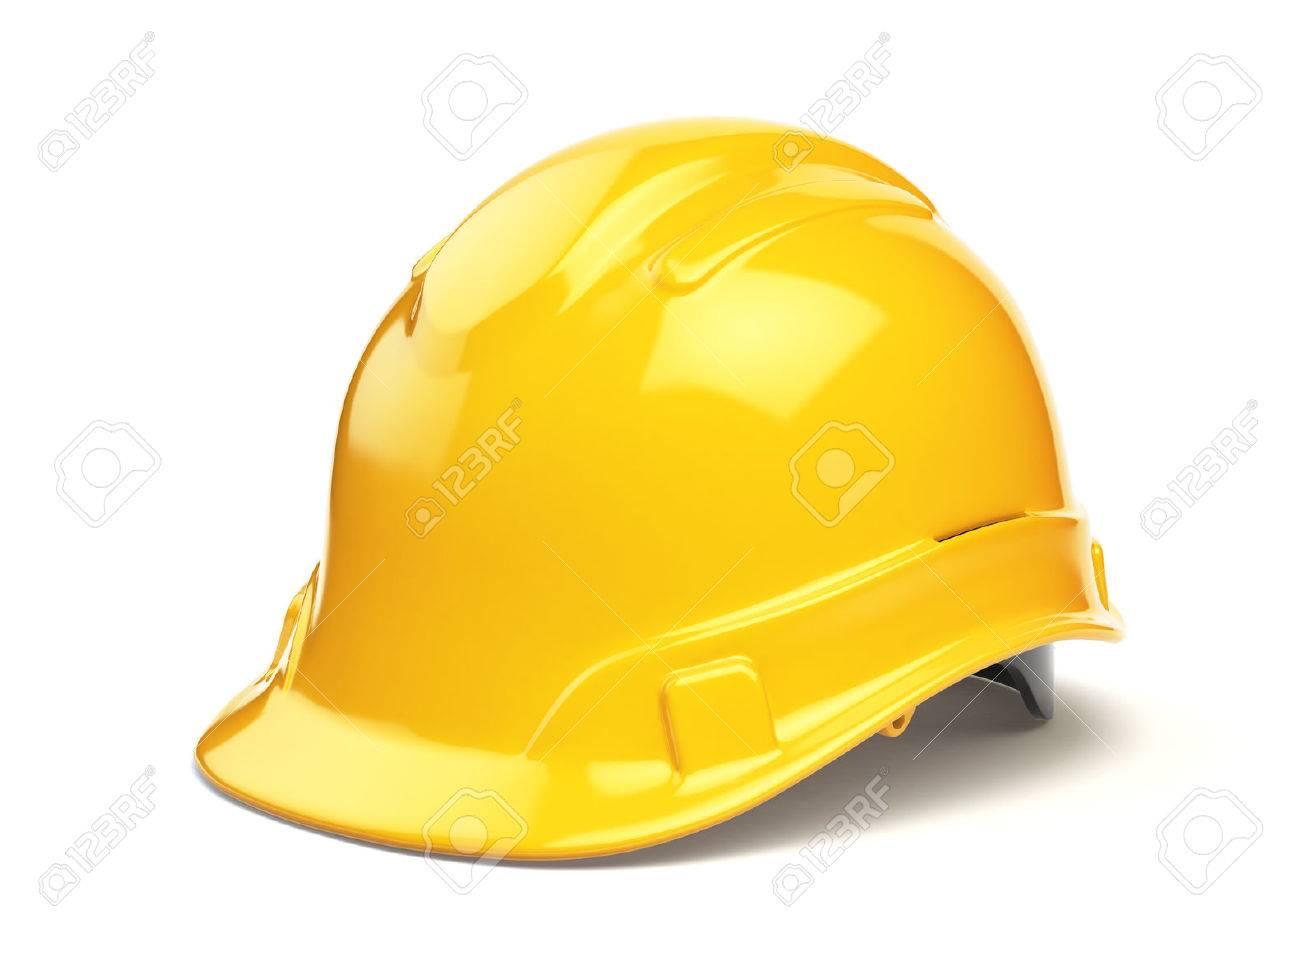 Yellow hard hat, safety helmet isolated on white. 3d illustration - 64134003